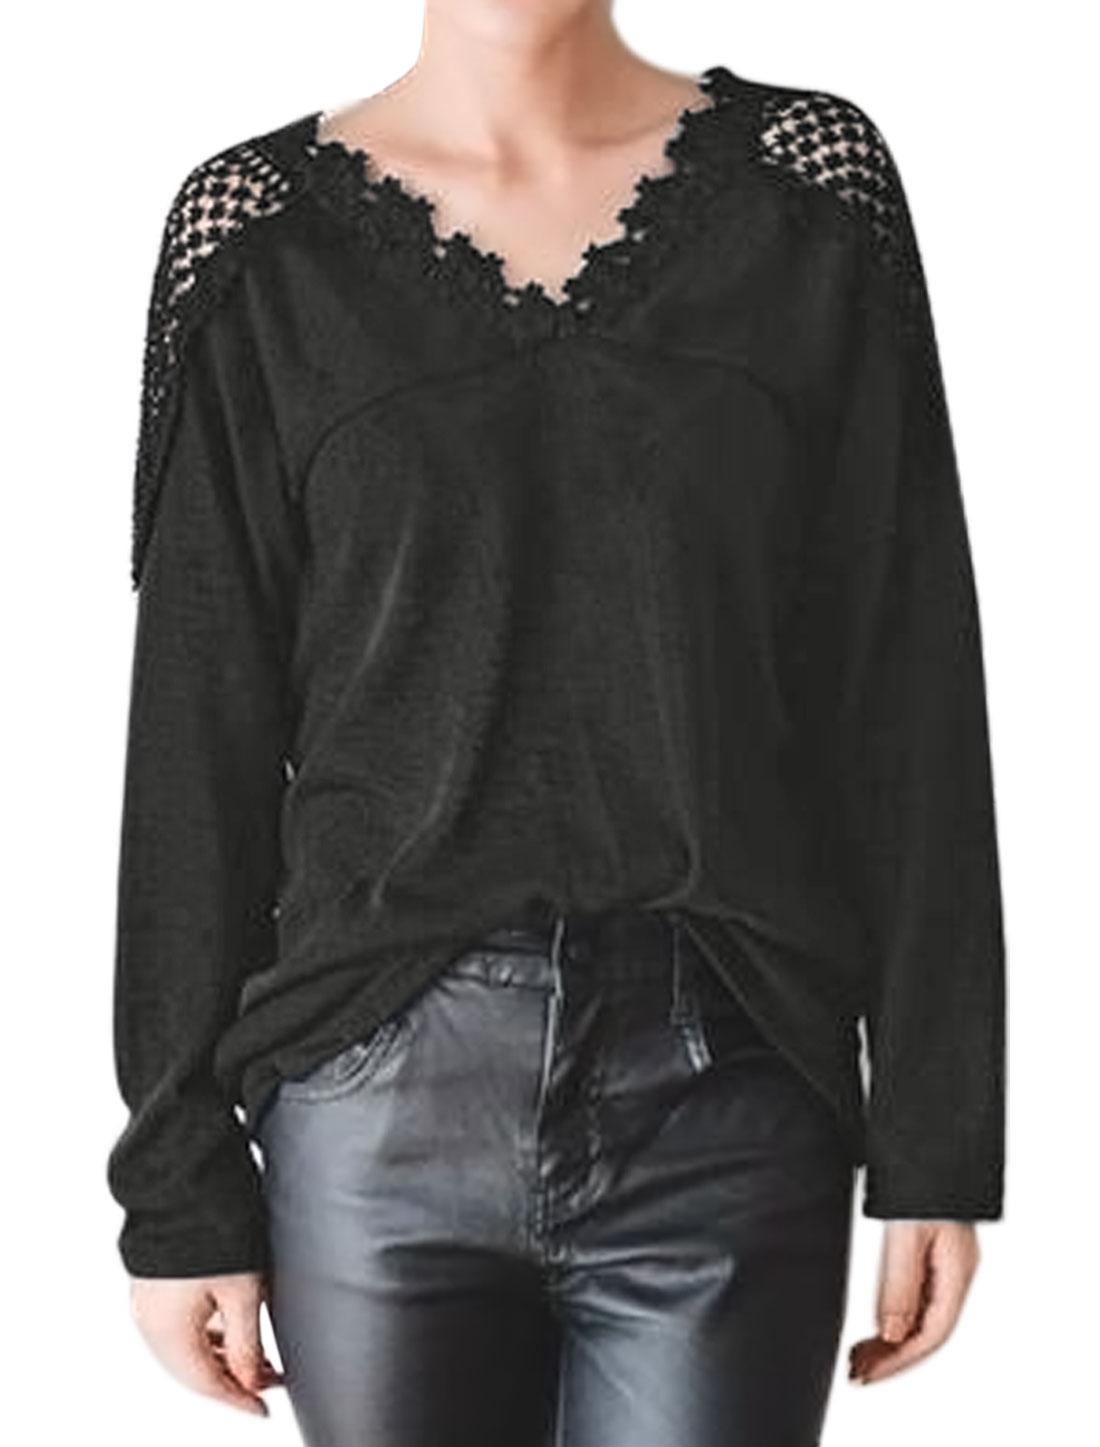 Women V Neckline Long Dolman Sleeves Crochet Panel Casual T-Shirt Black XS